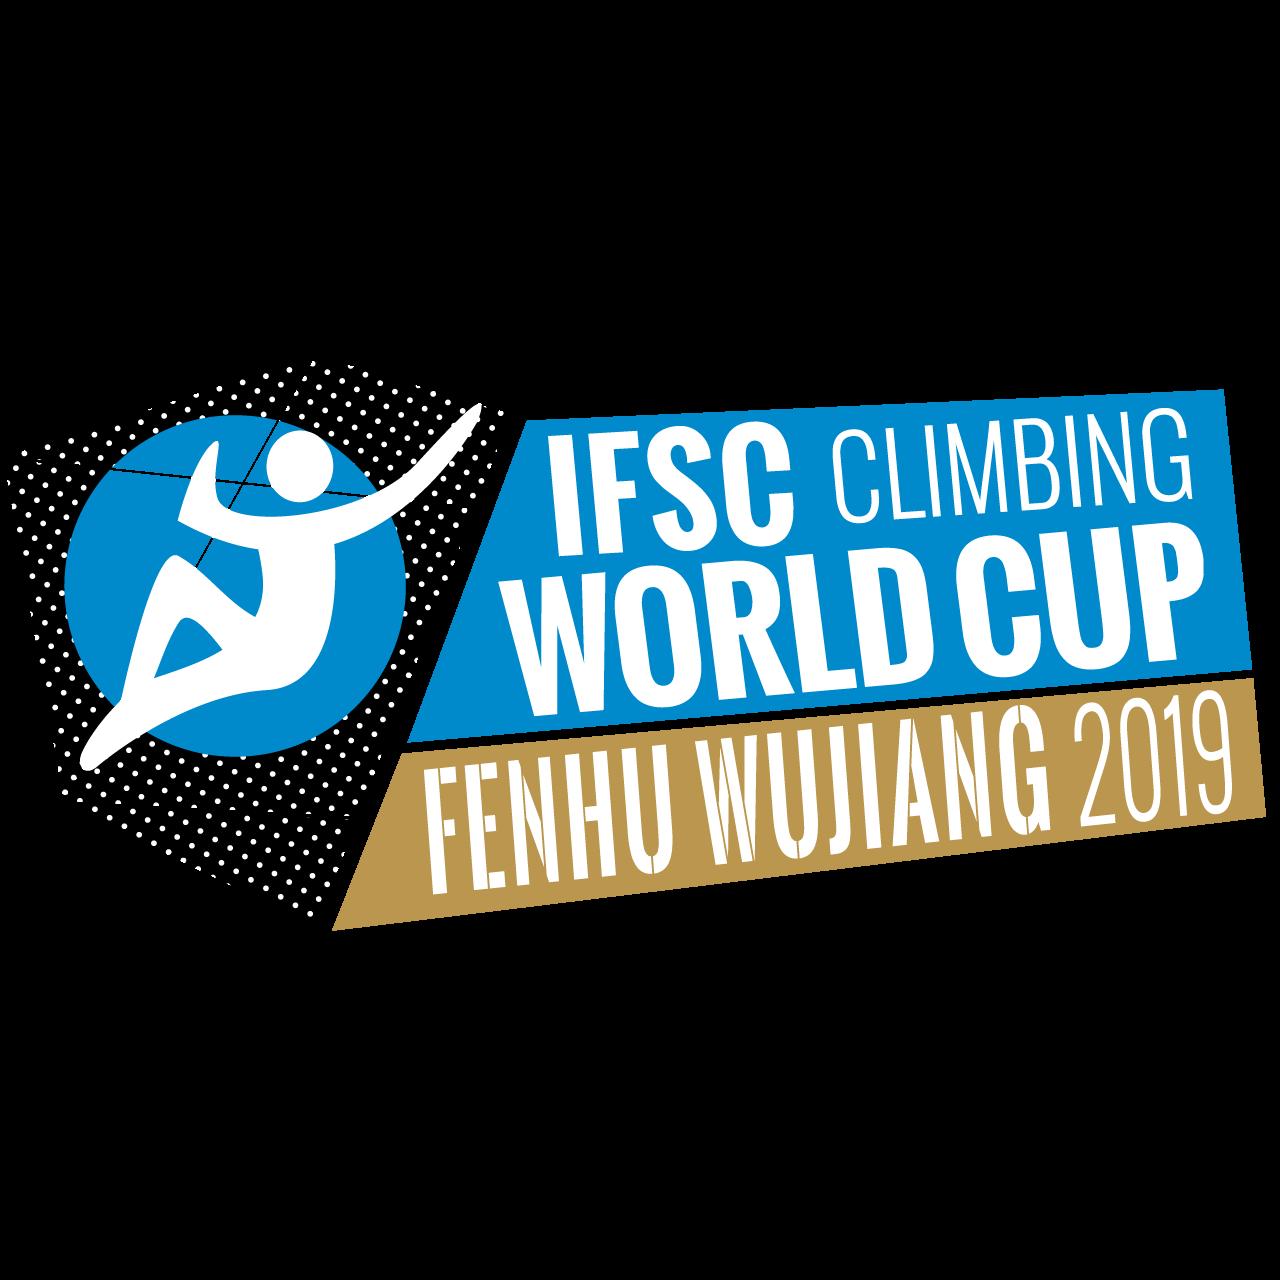 2019 IFSC Climbing World Cup